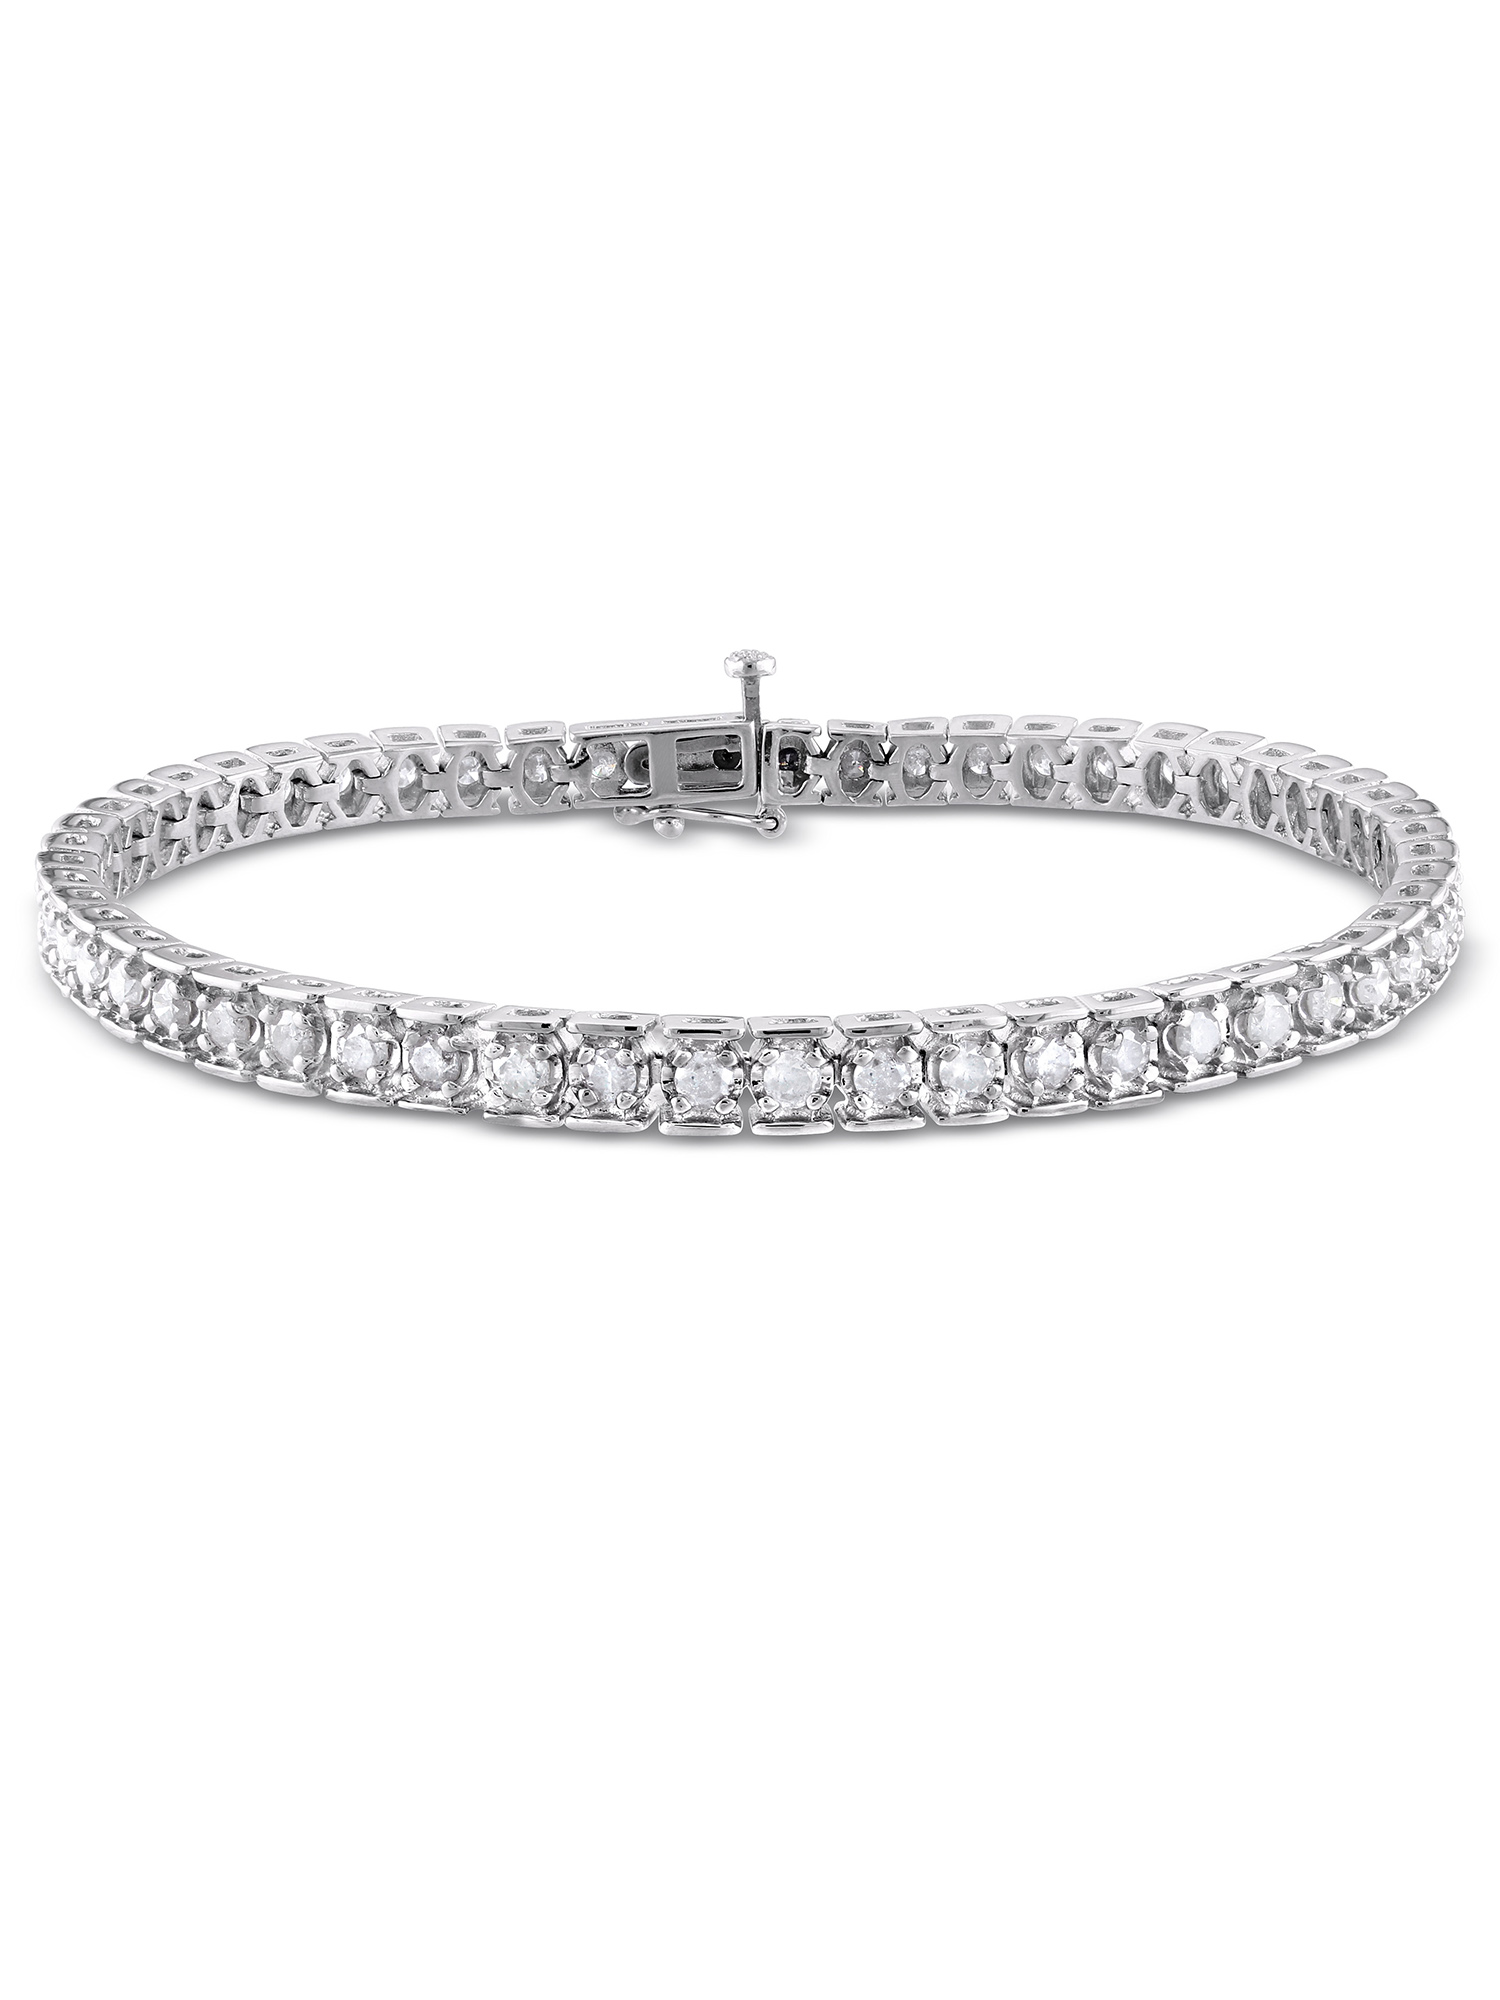 "Miabella 3 Carat T.W. Diamond Sterling Silver Tennis Bracelet, 7.25"" by Miabella"